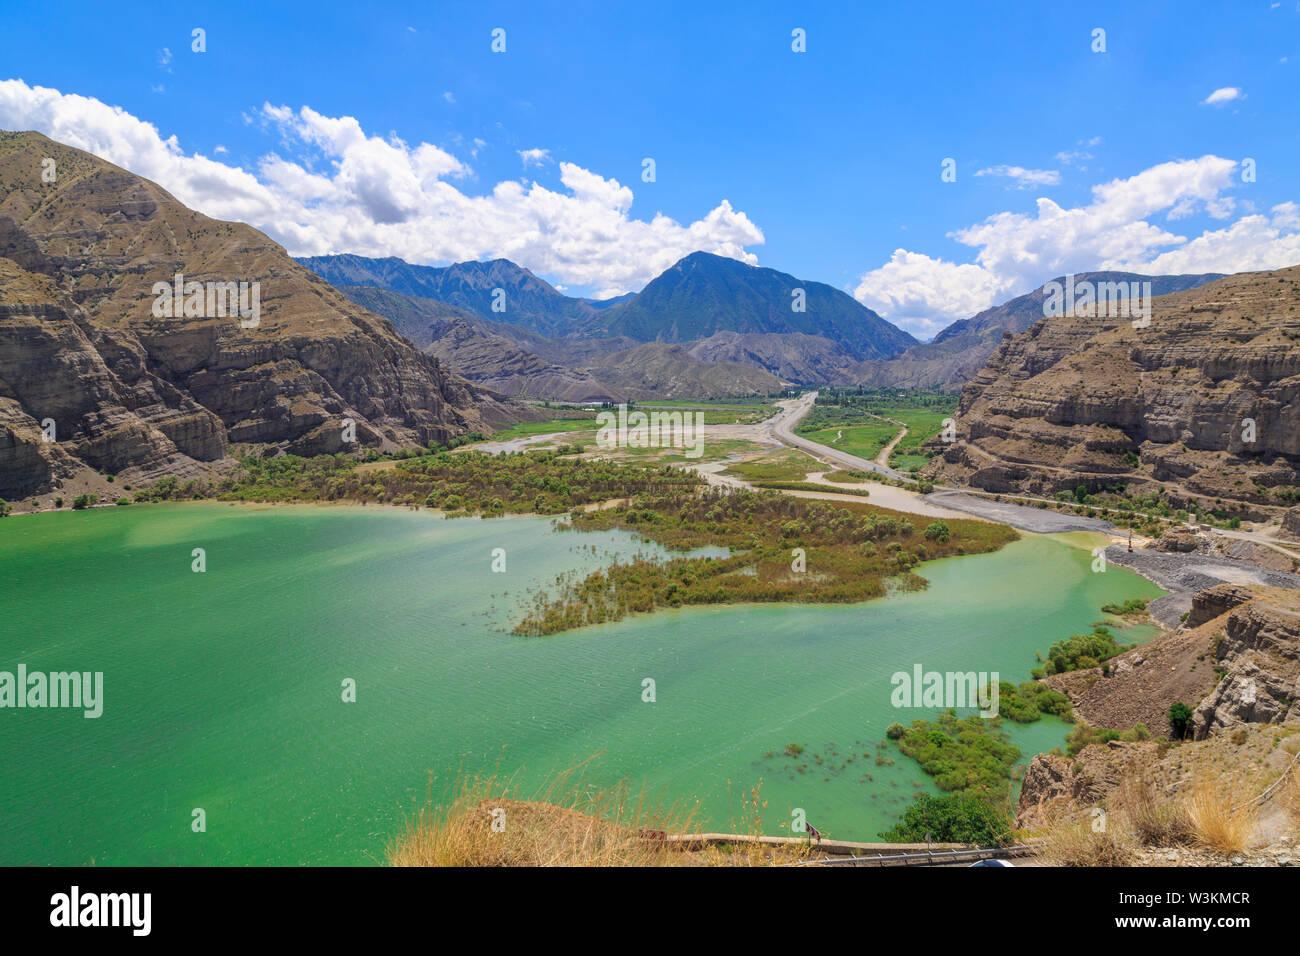 Tortum (uzundere) lake during summer time in Erzurum, Turkey - Stock Image